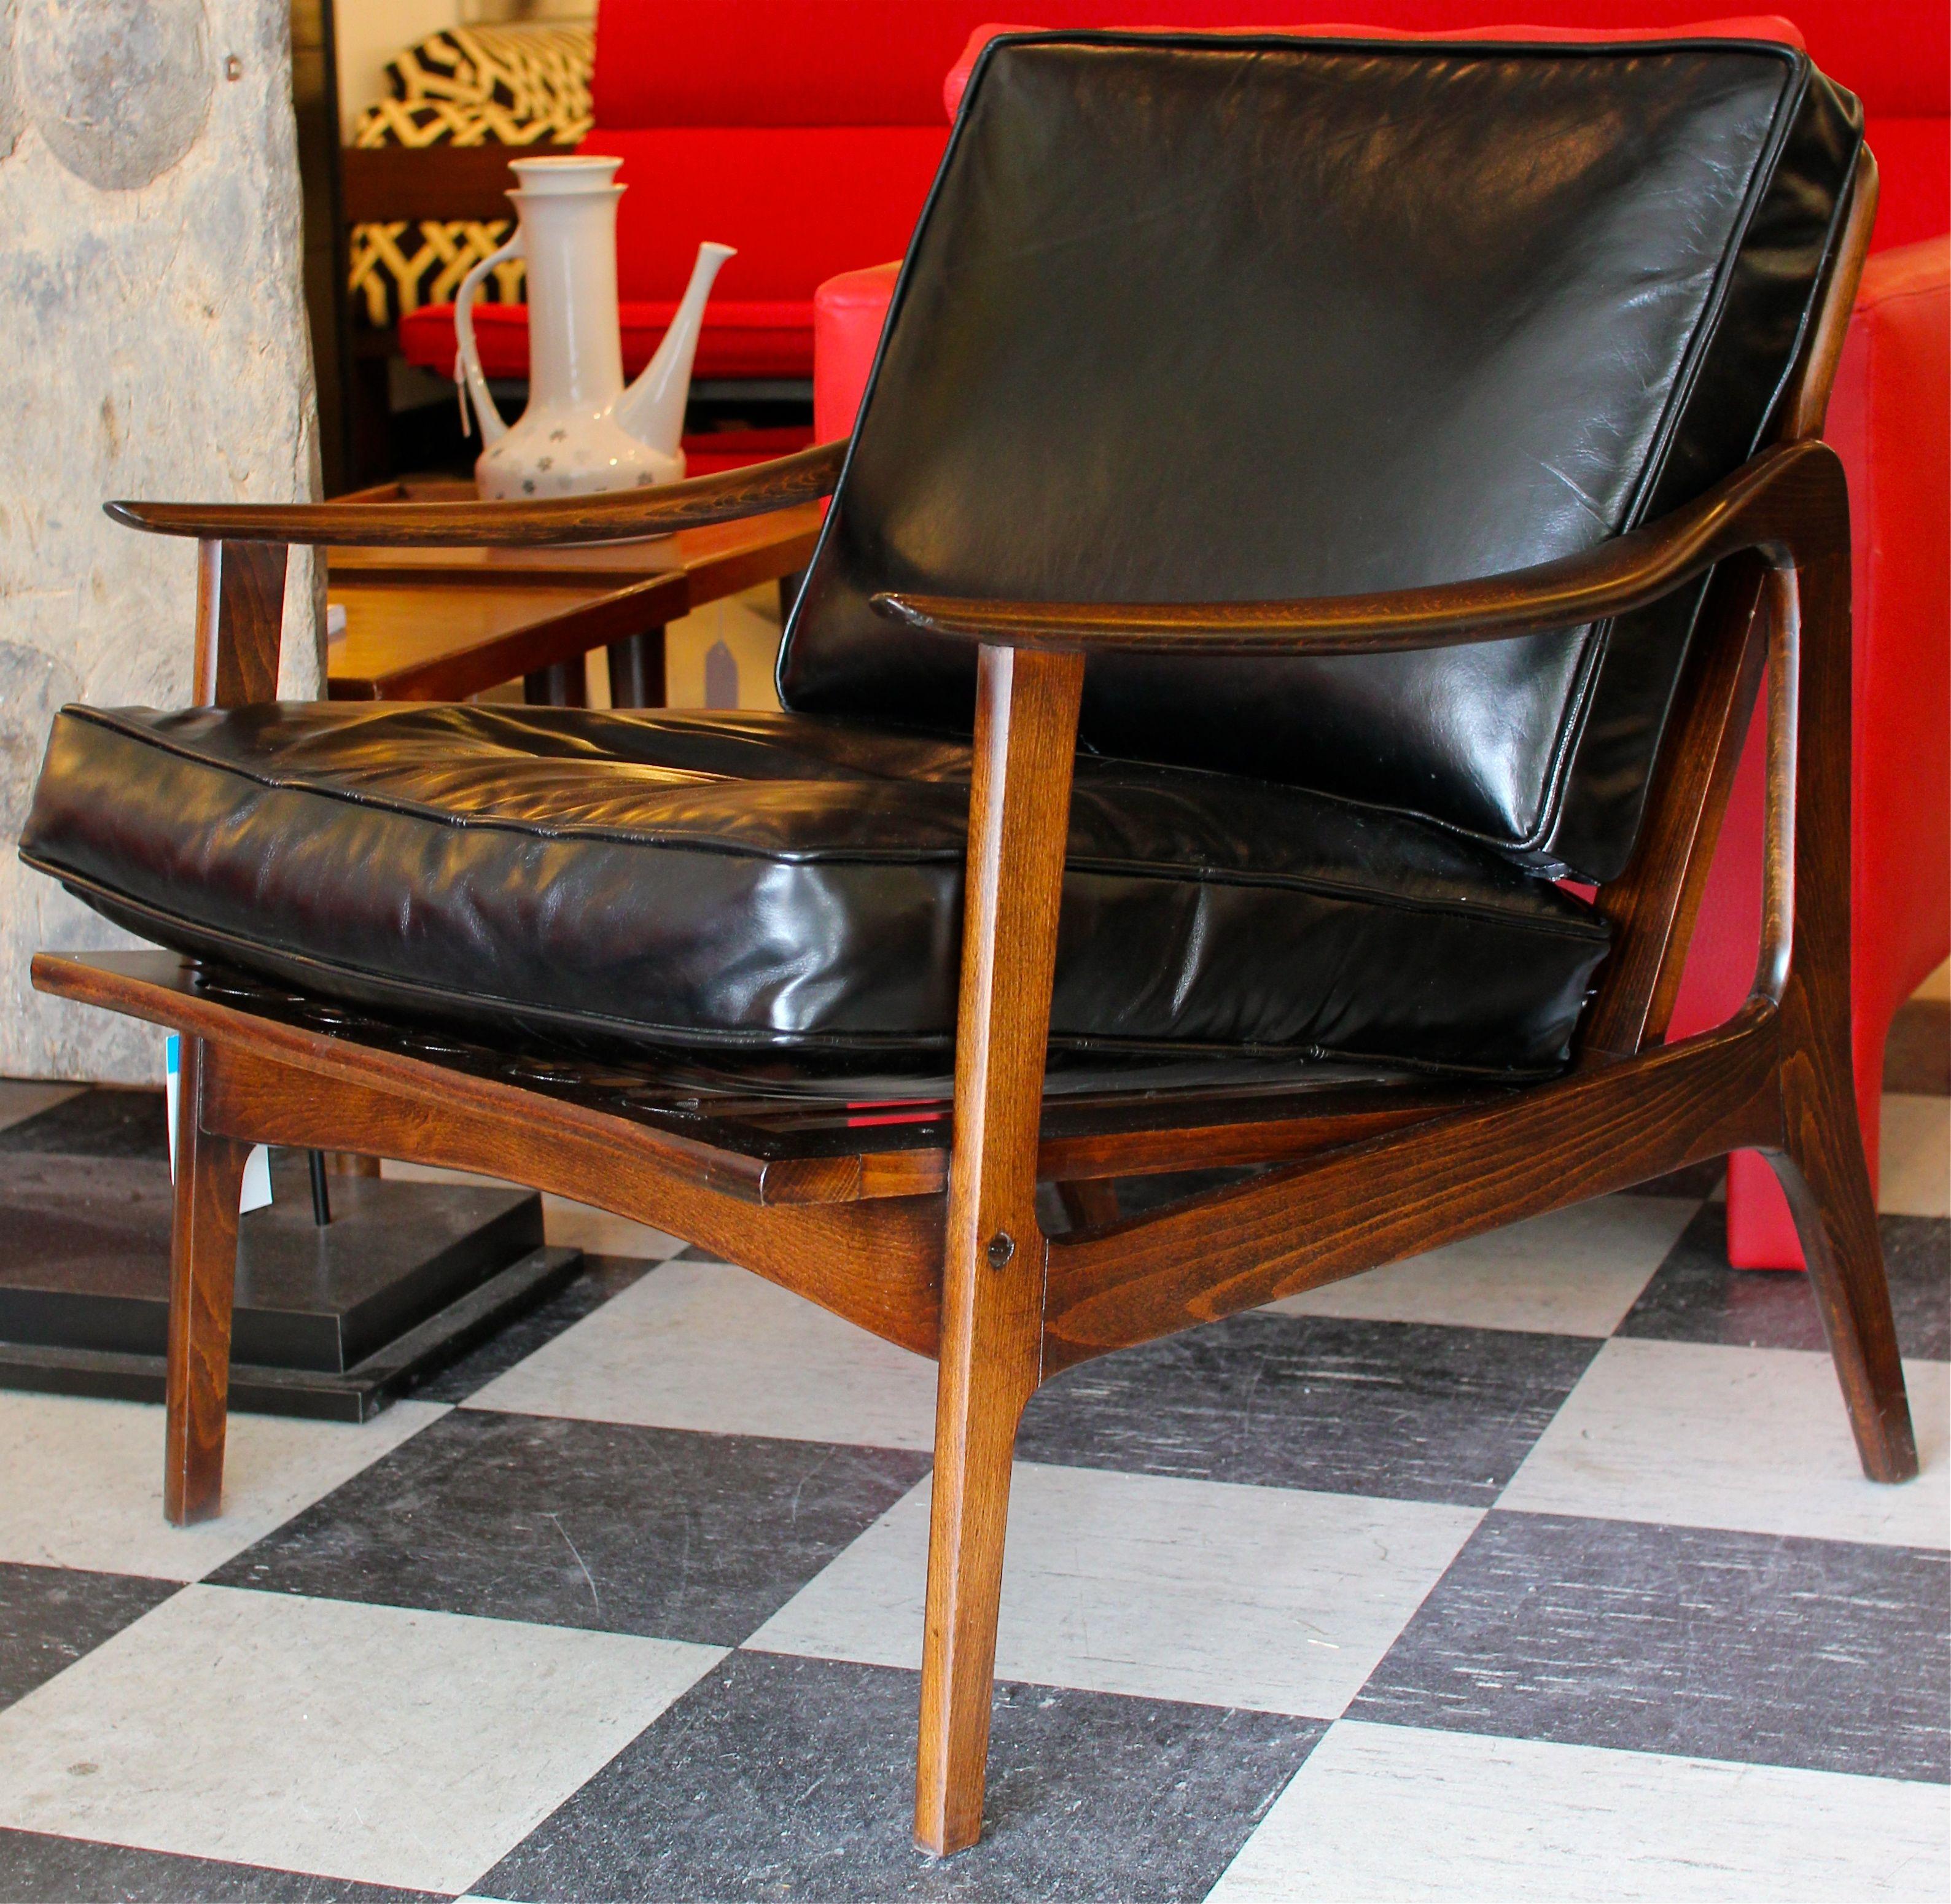 Incredible Leather Danish Lounge Chair Mid Century Leather Chair Inzonedesignstudio Interior Chair Design Inzonedesignstudiocom